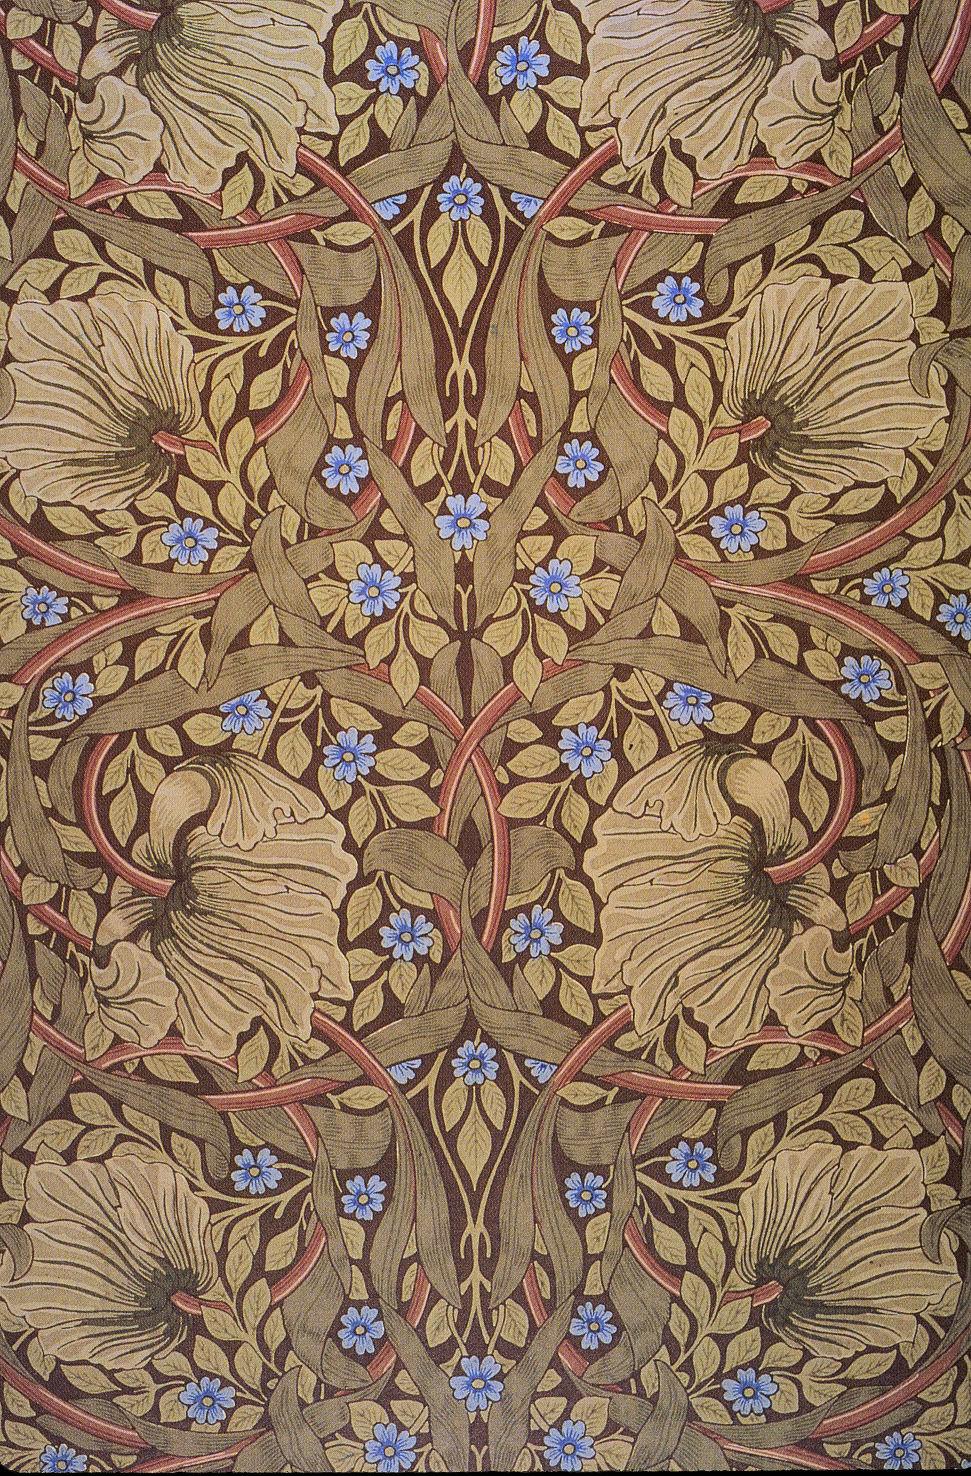 File:Morris Pimpernel printed textile 1876.jpg - Wikimedia